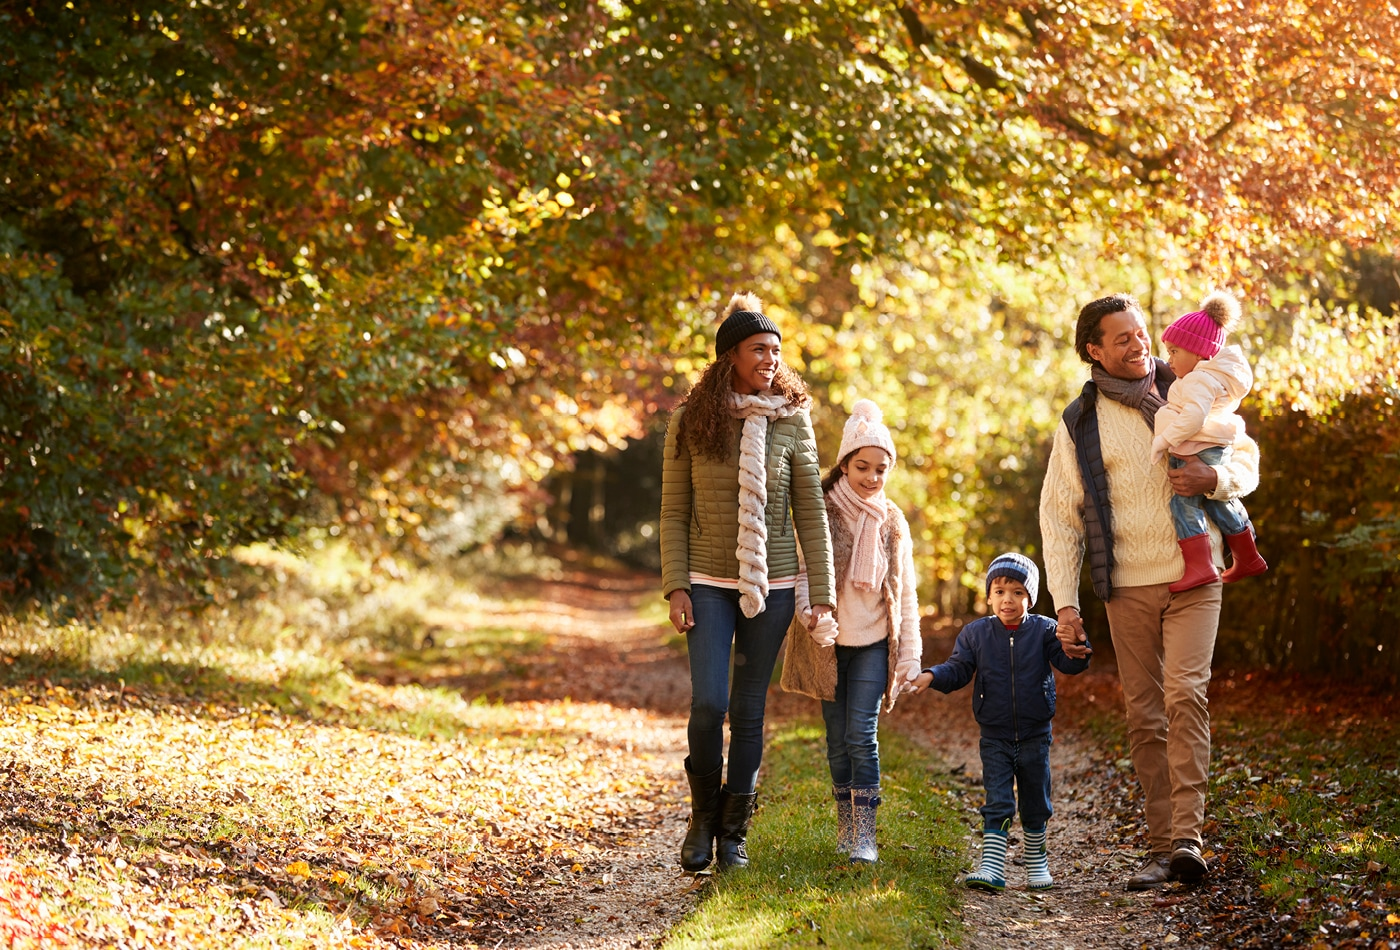 Autumn Family Walk